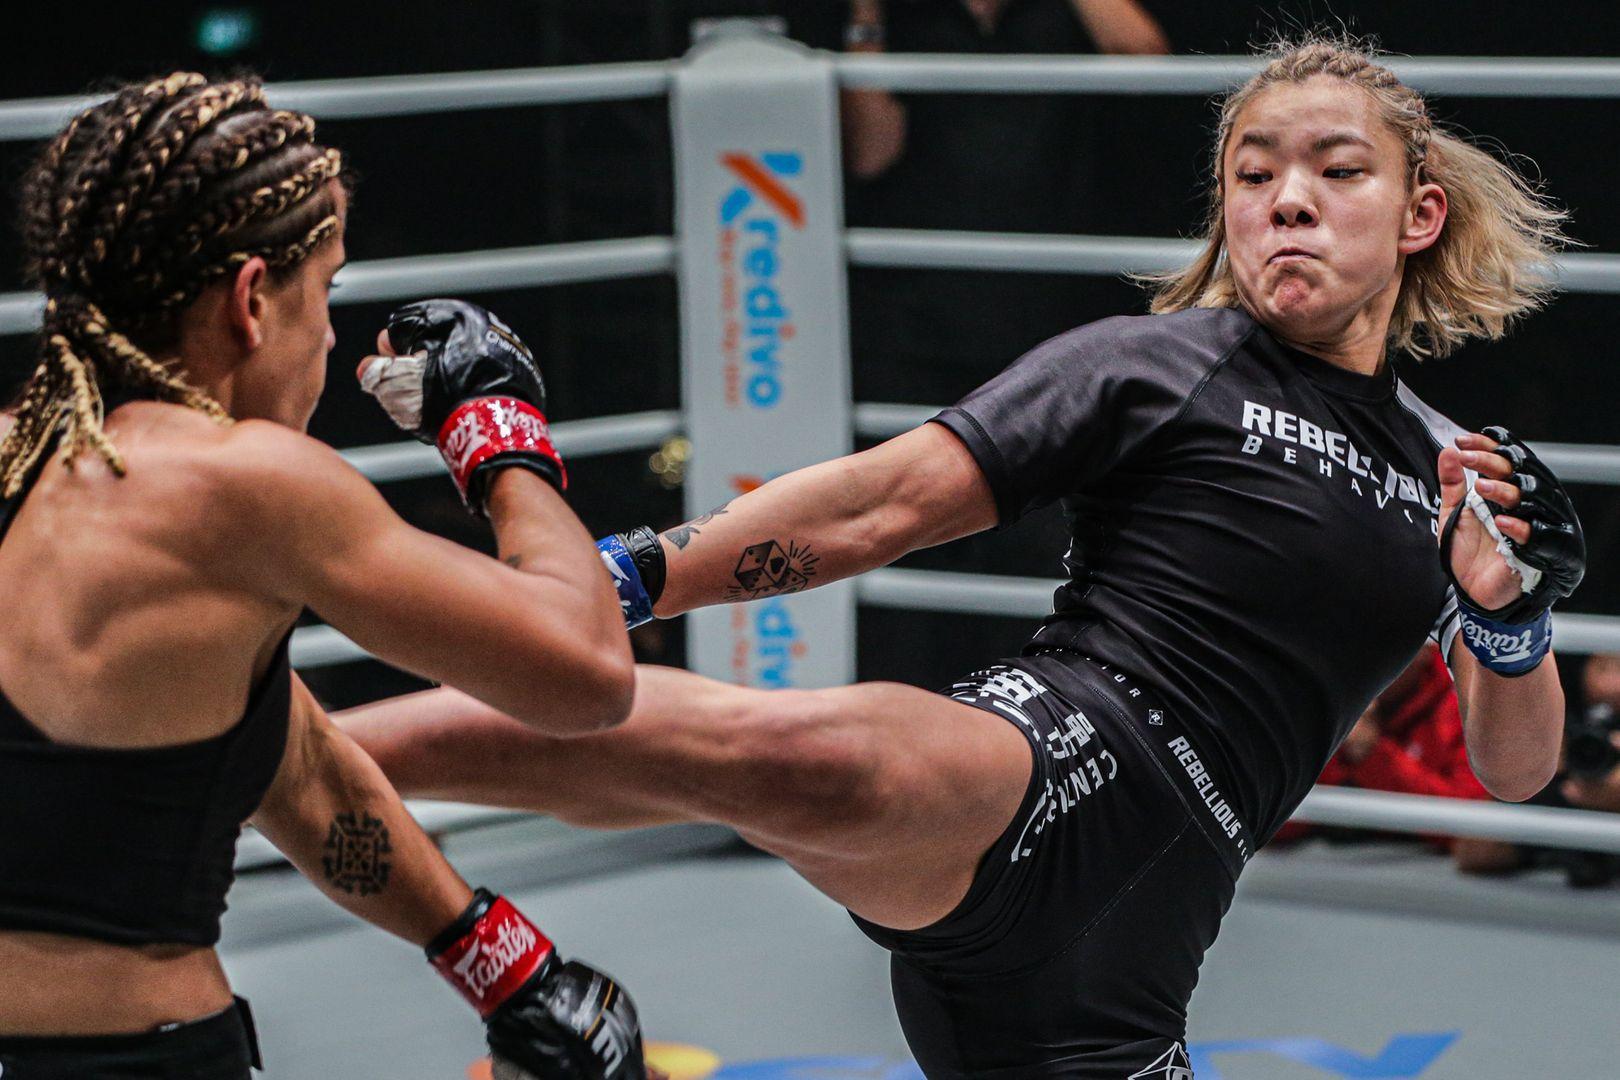 Japanese MMA fighter Itsuki Hirata throws a kick